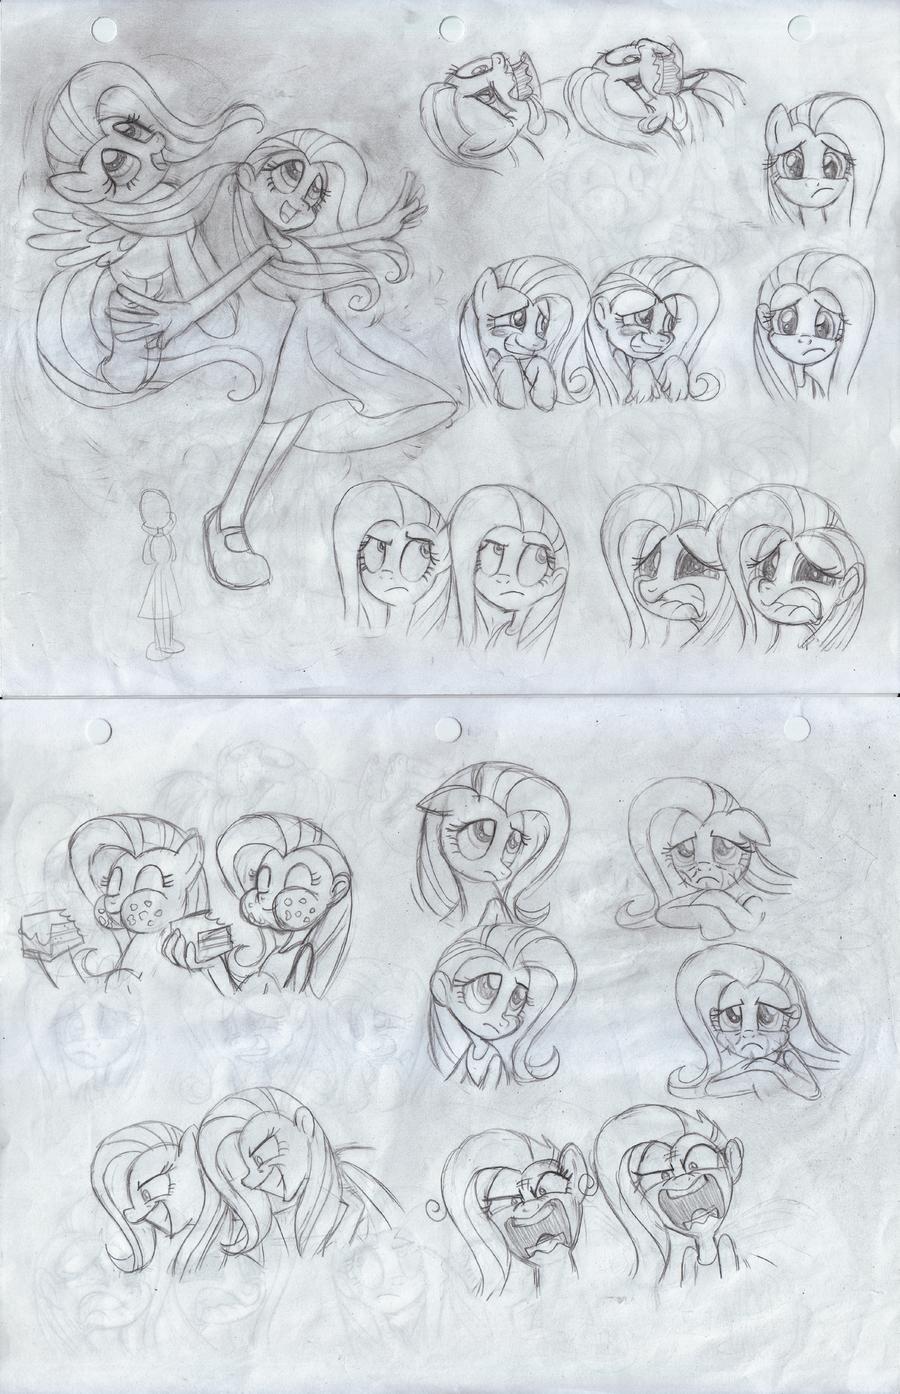 Fluttershy- Pony/ Human (Original sketch) by Trinityinyang